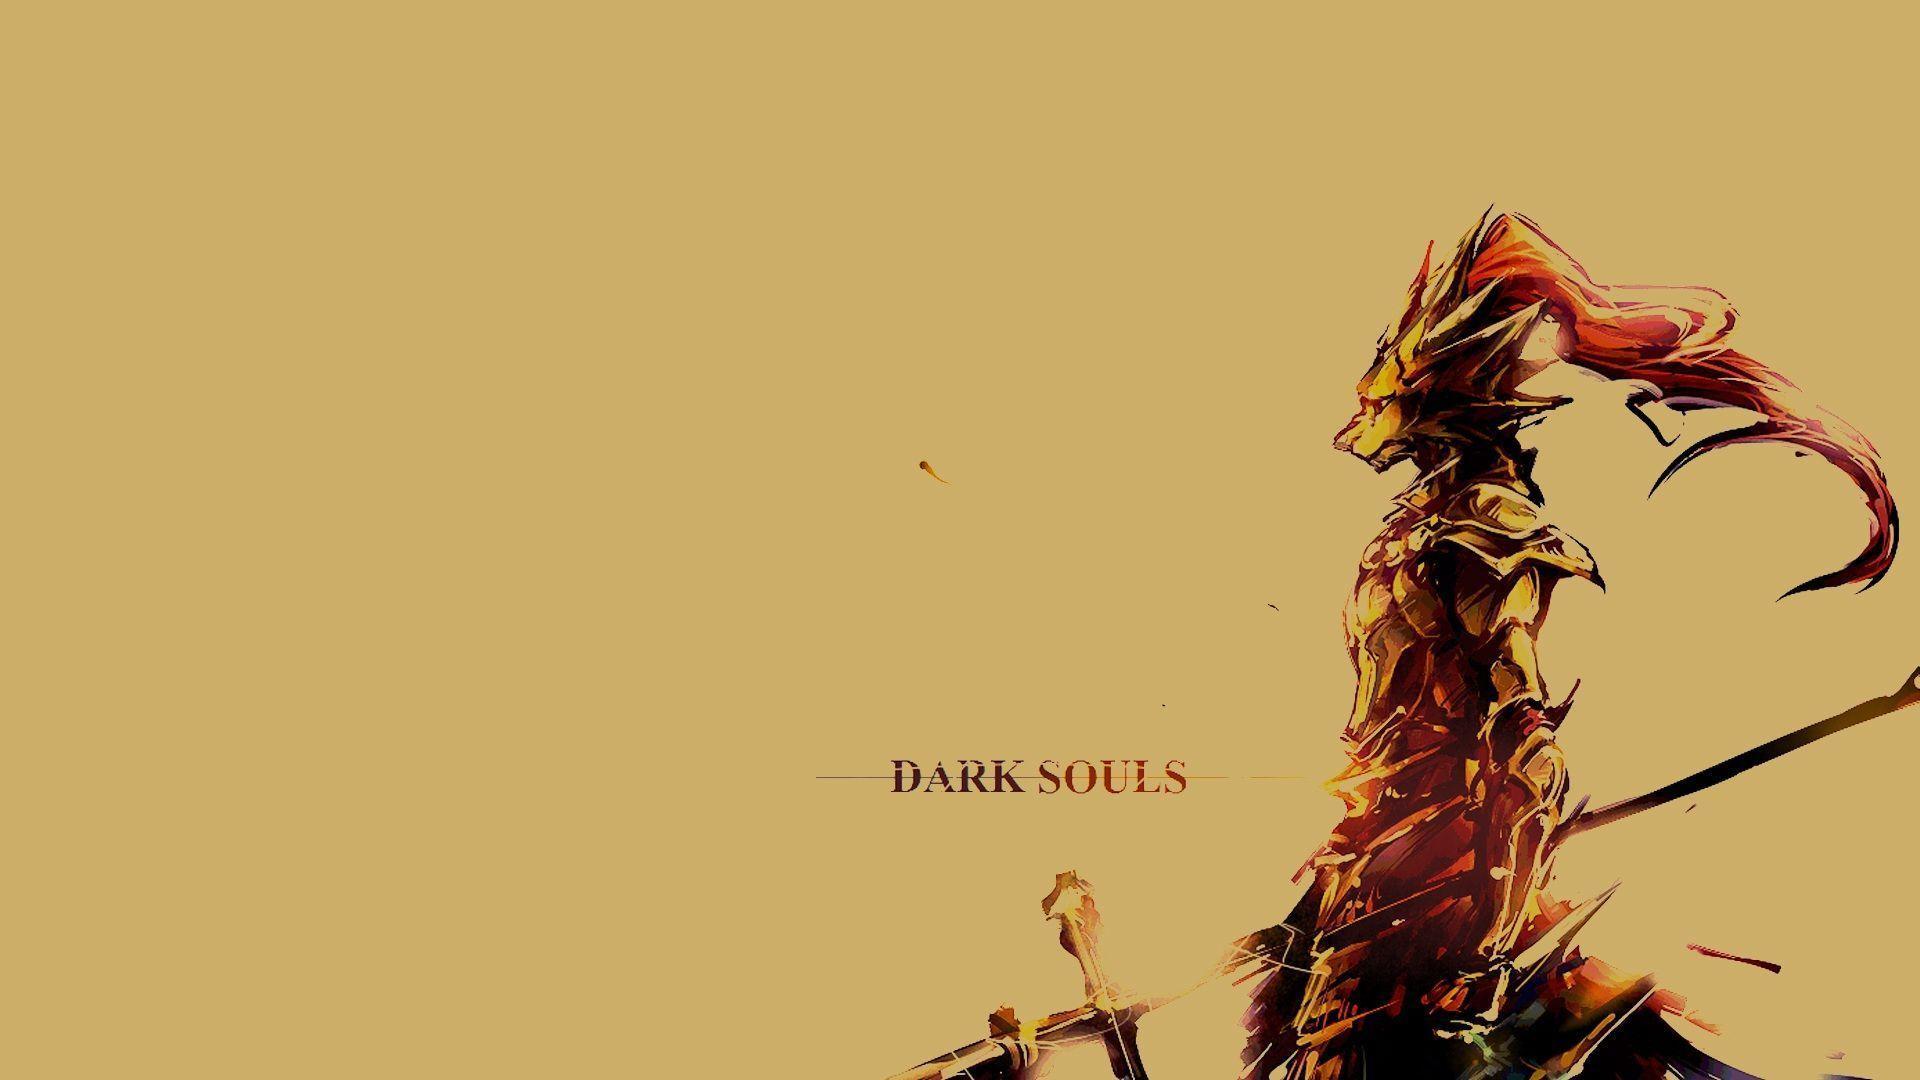 dark souls 3 wallpaper 1080p - photo #31